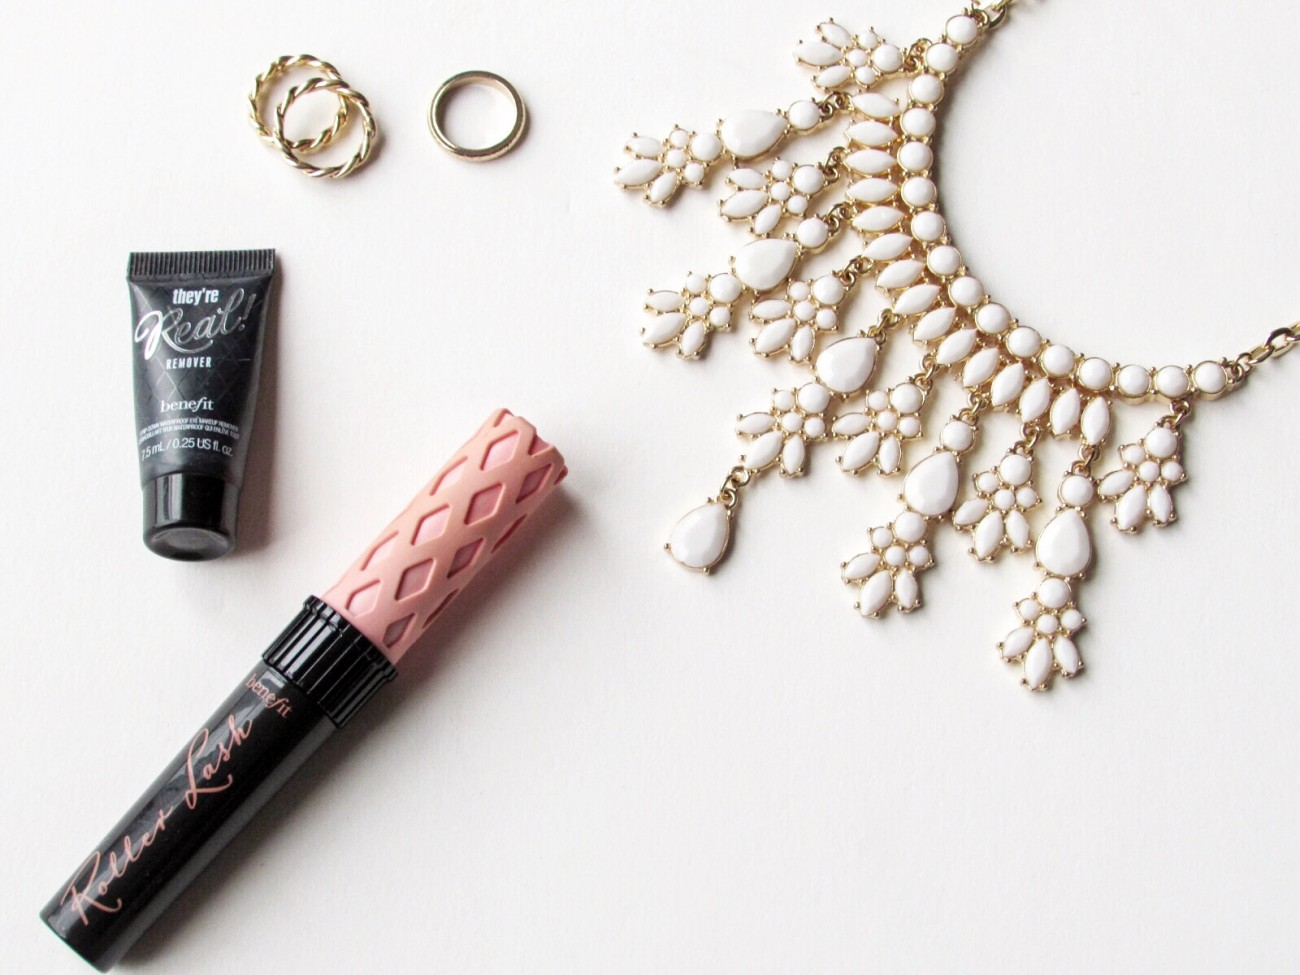 Benefit's Roller Lash Mascara Review sparkleshinylove.com